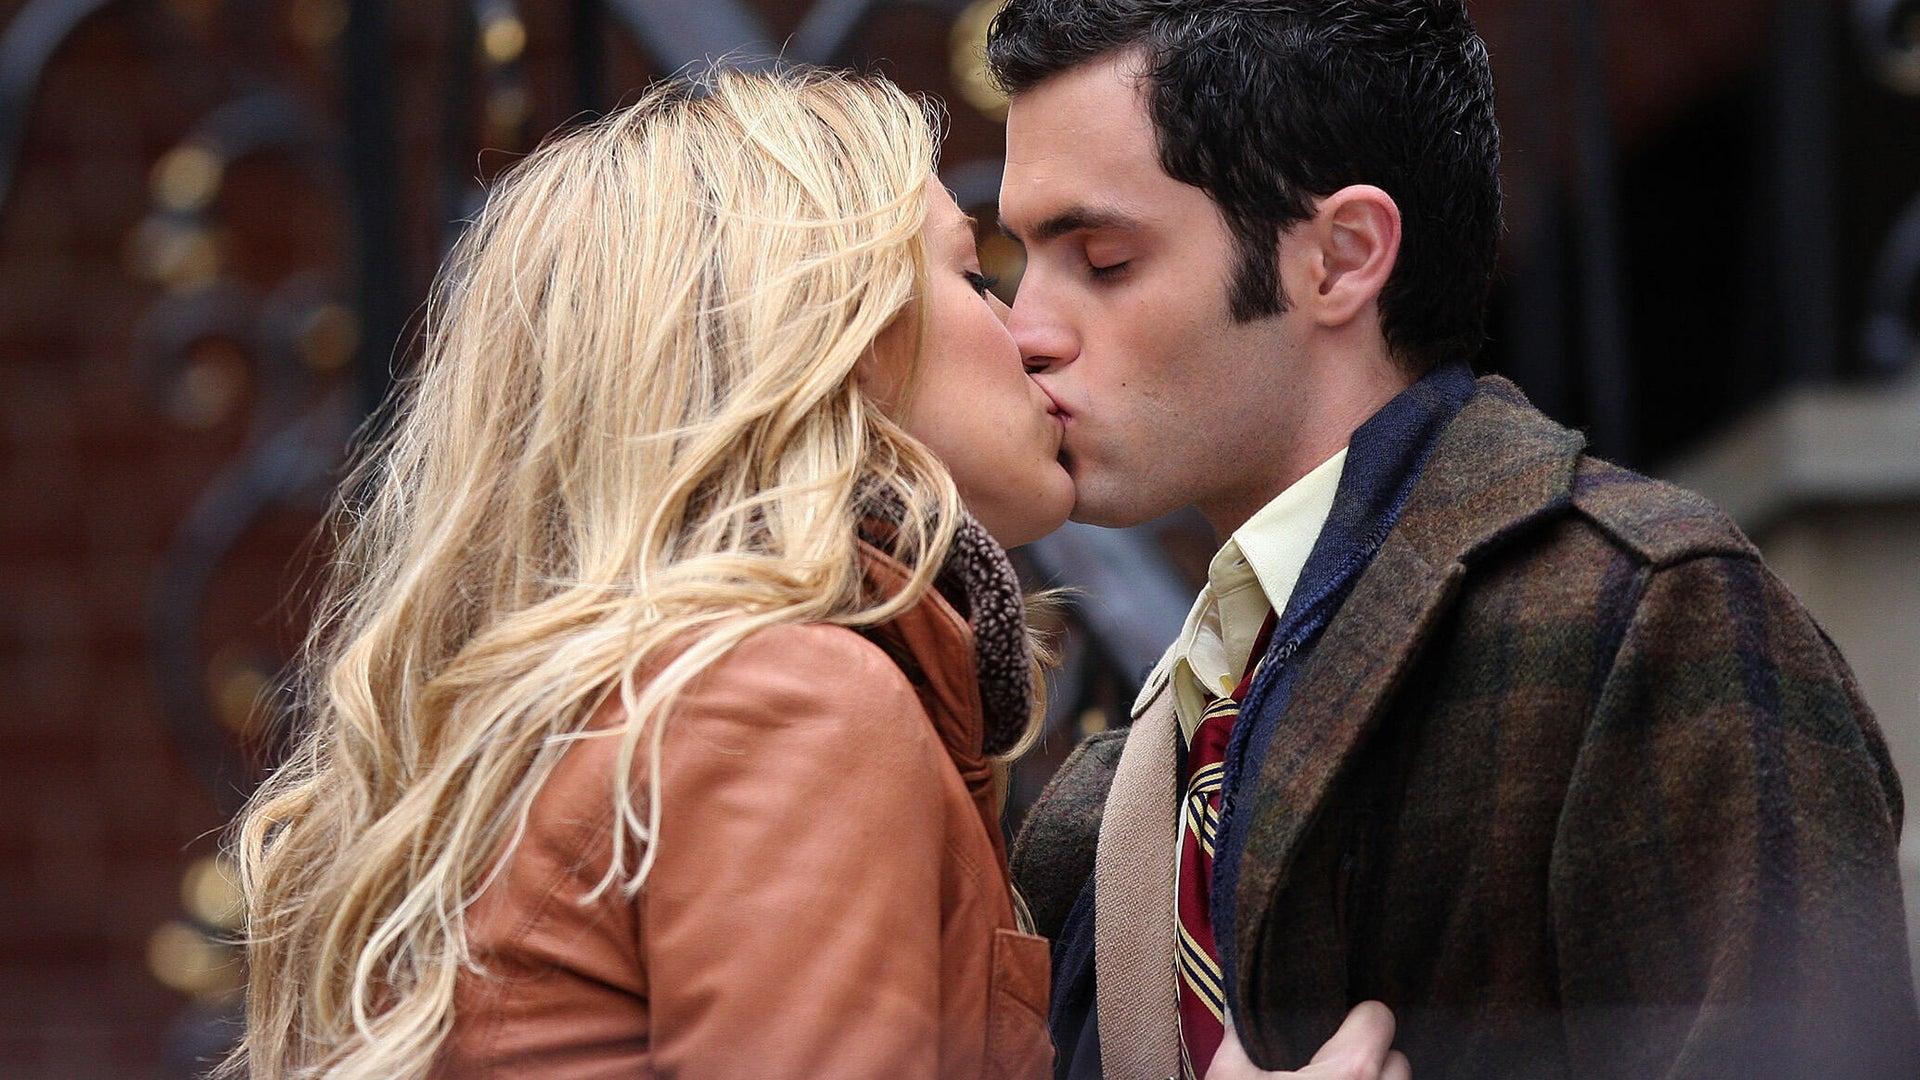 Blake Lively and Penn Badgley, Gossip Girl